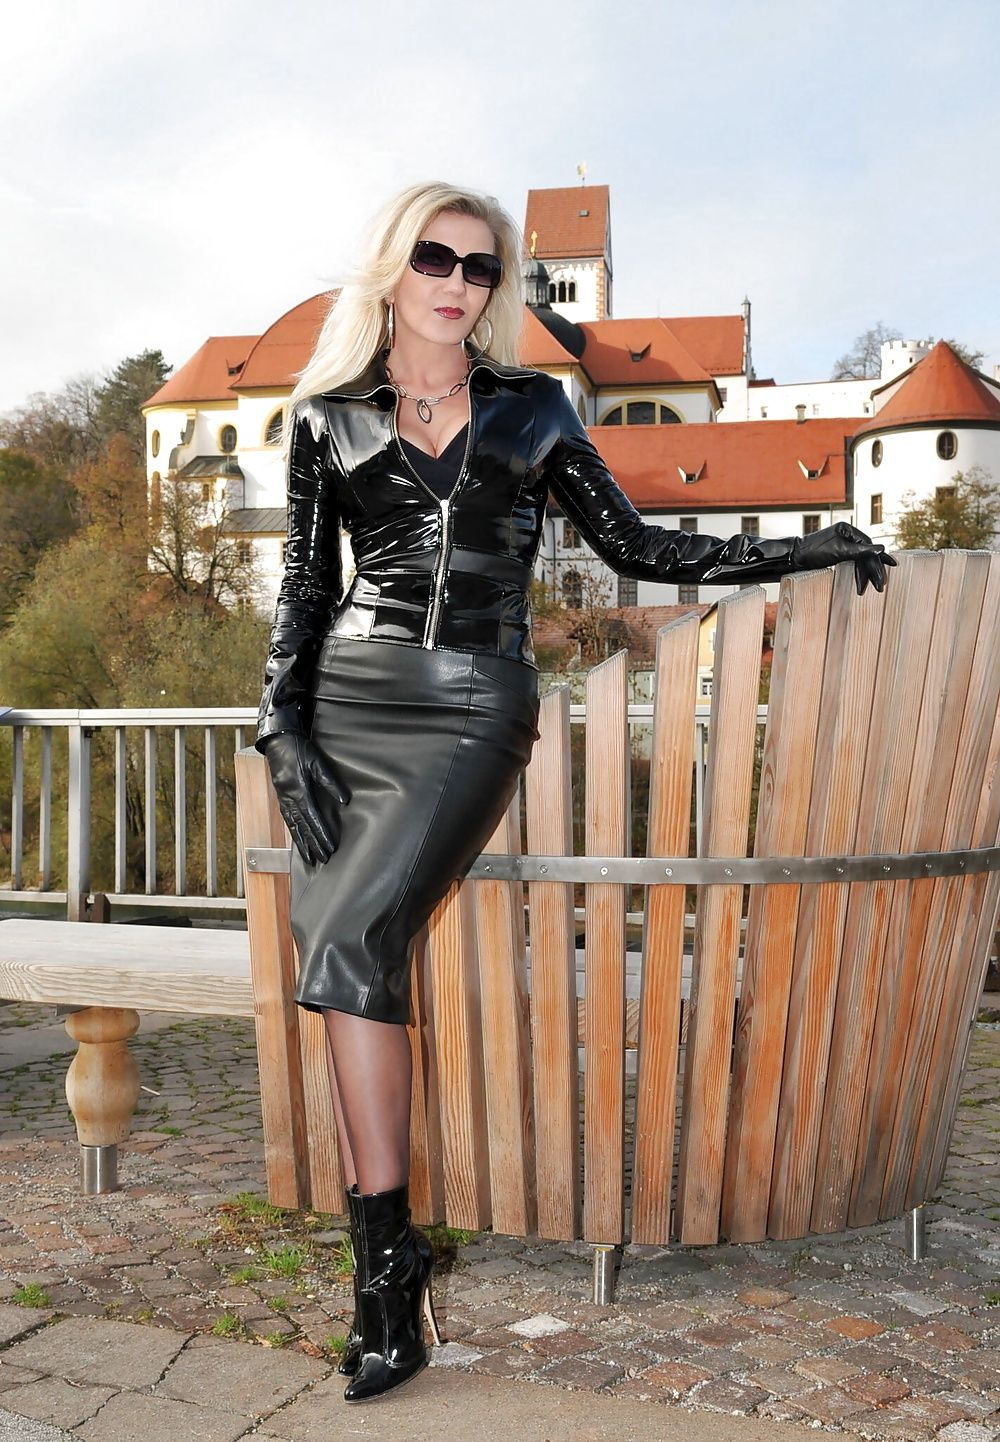 callgirls dortmund lady heike